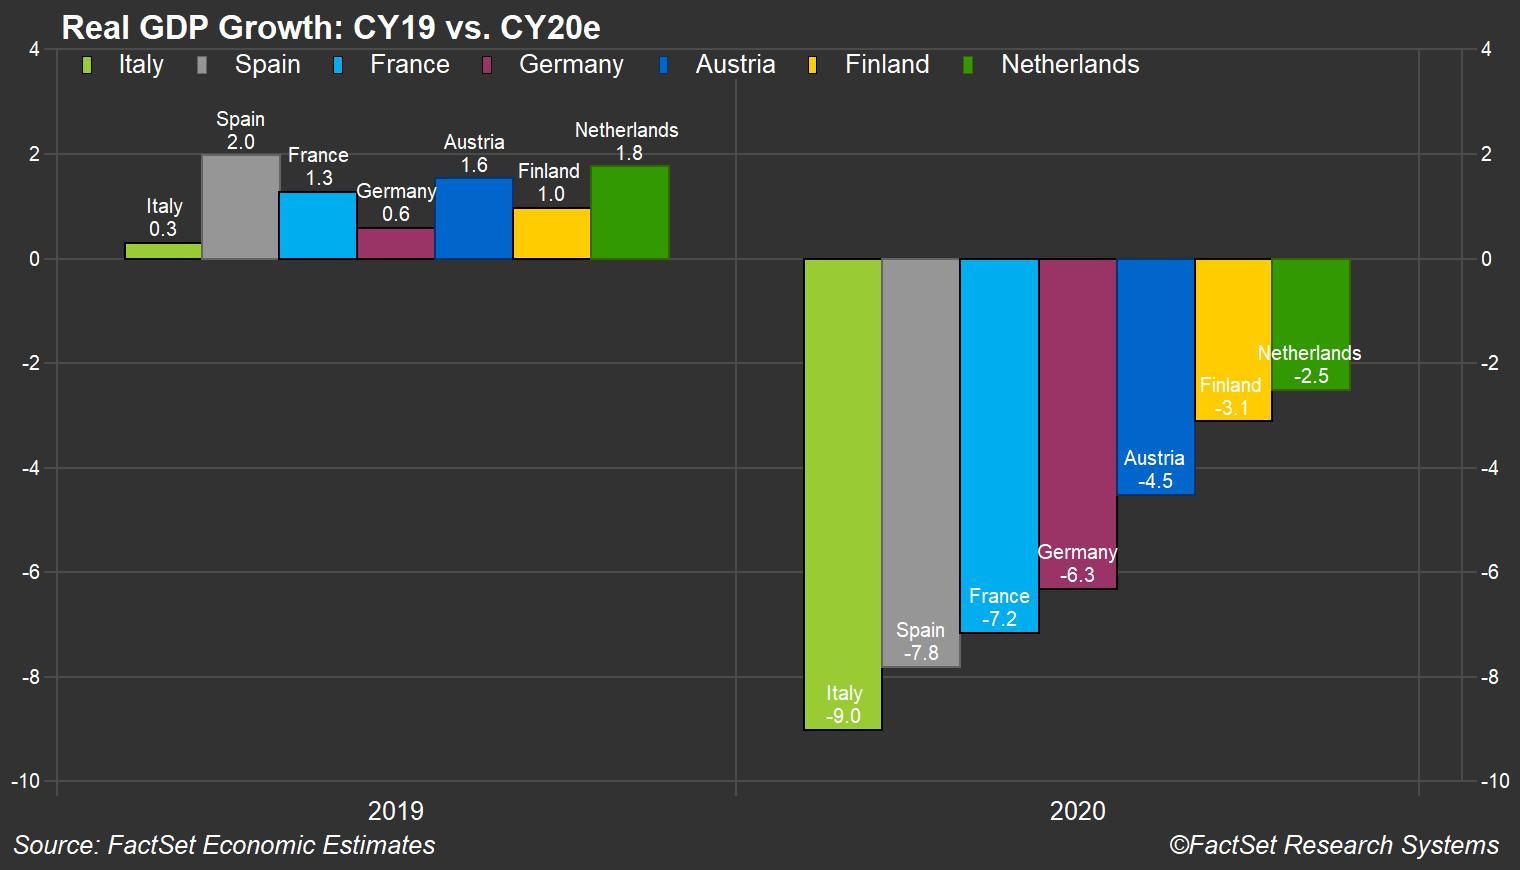 Real GDP Growth CY19 vs CY20